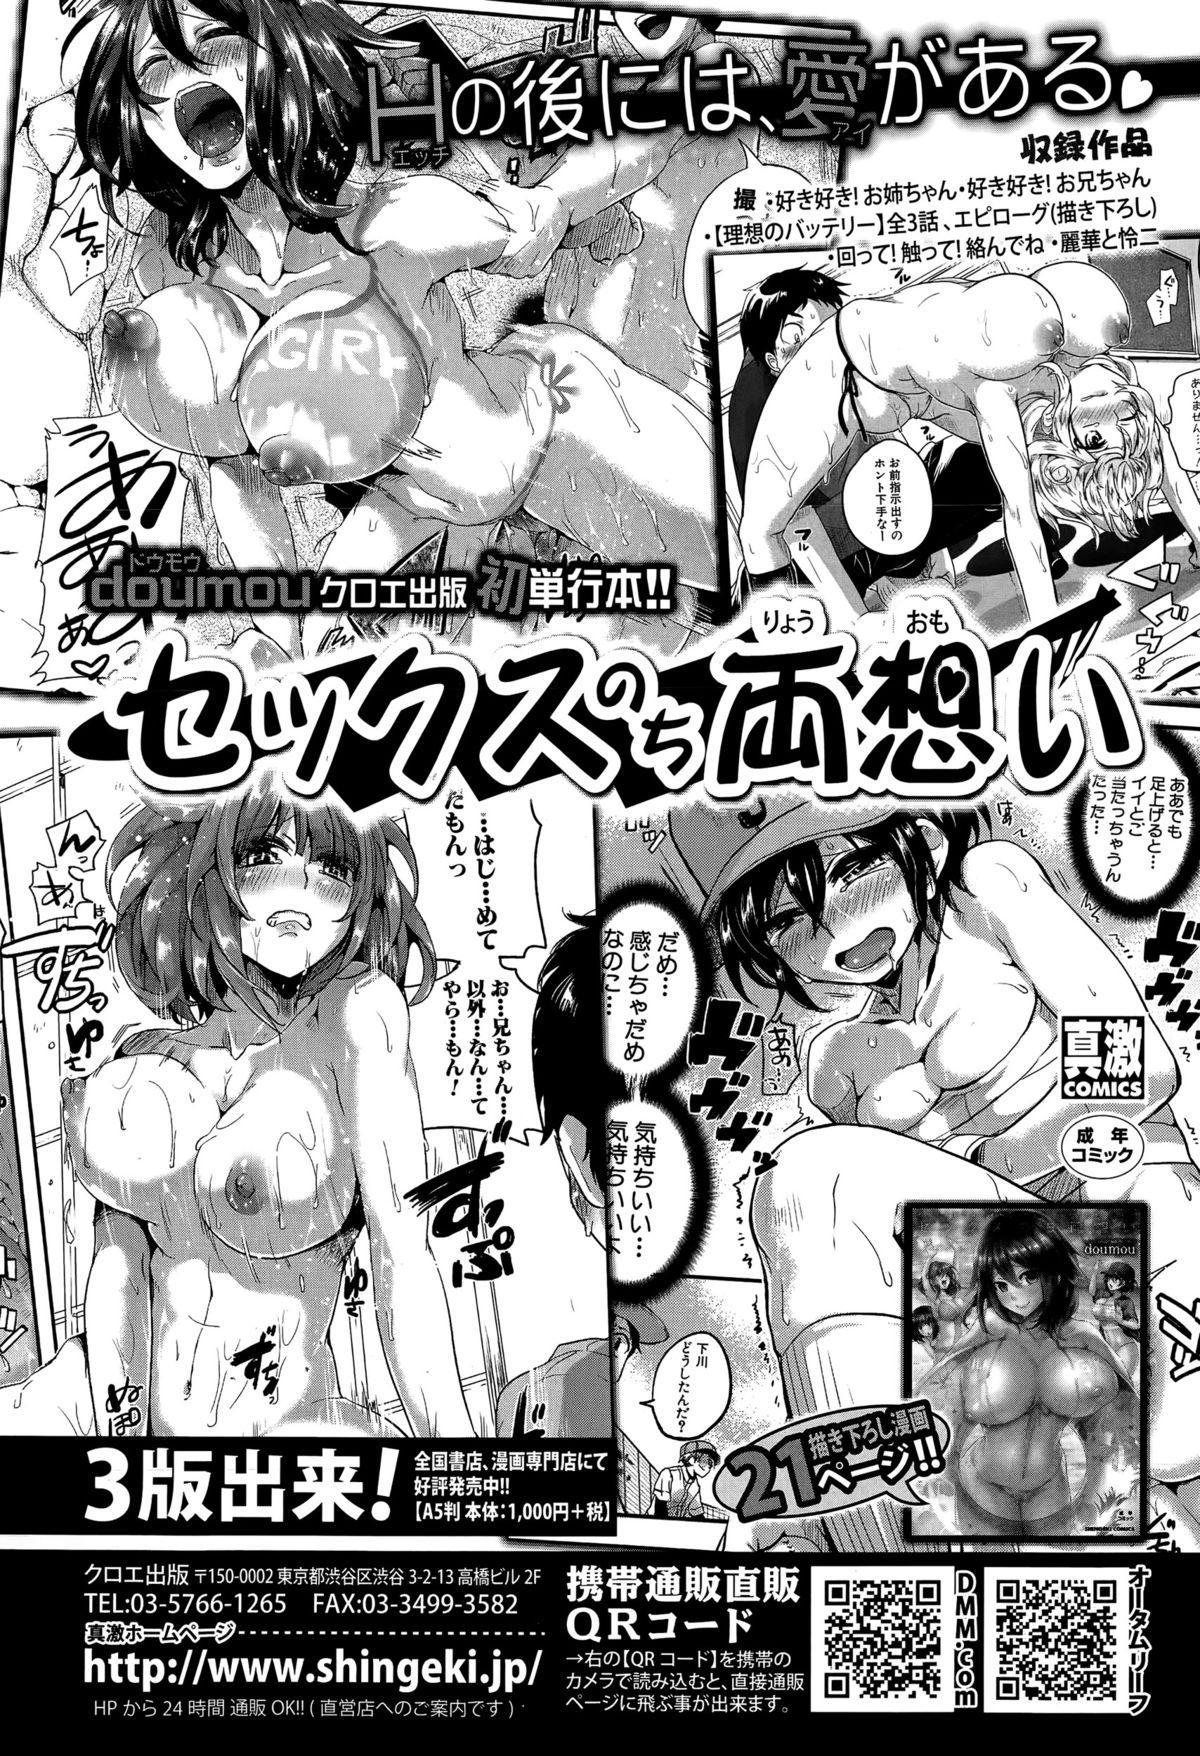 COMIC Shingeki 2015-07 36